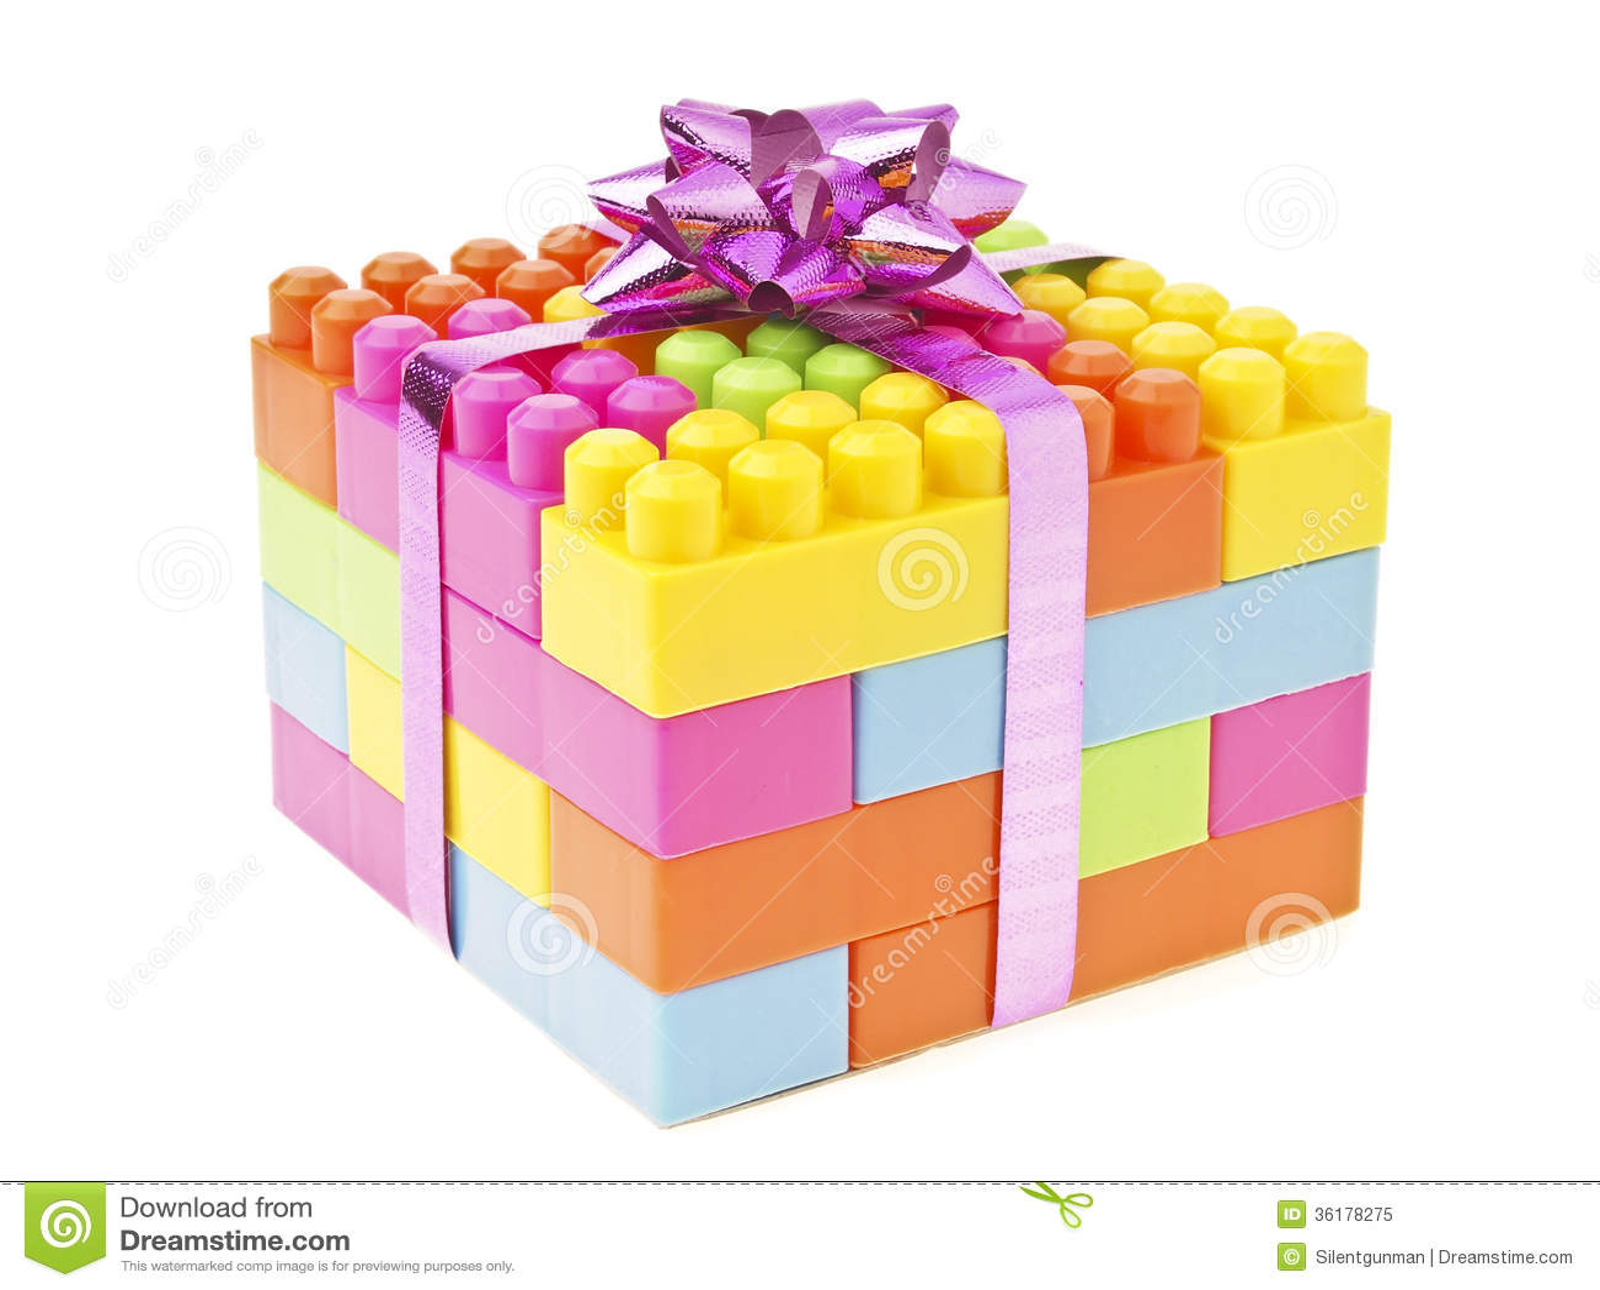 Brick toy gift